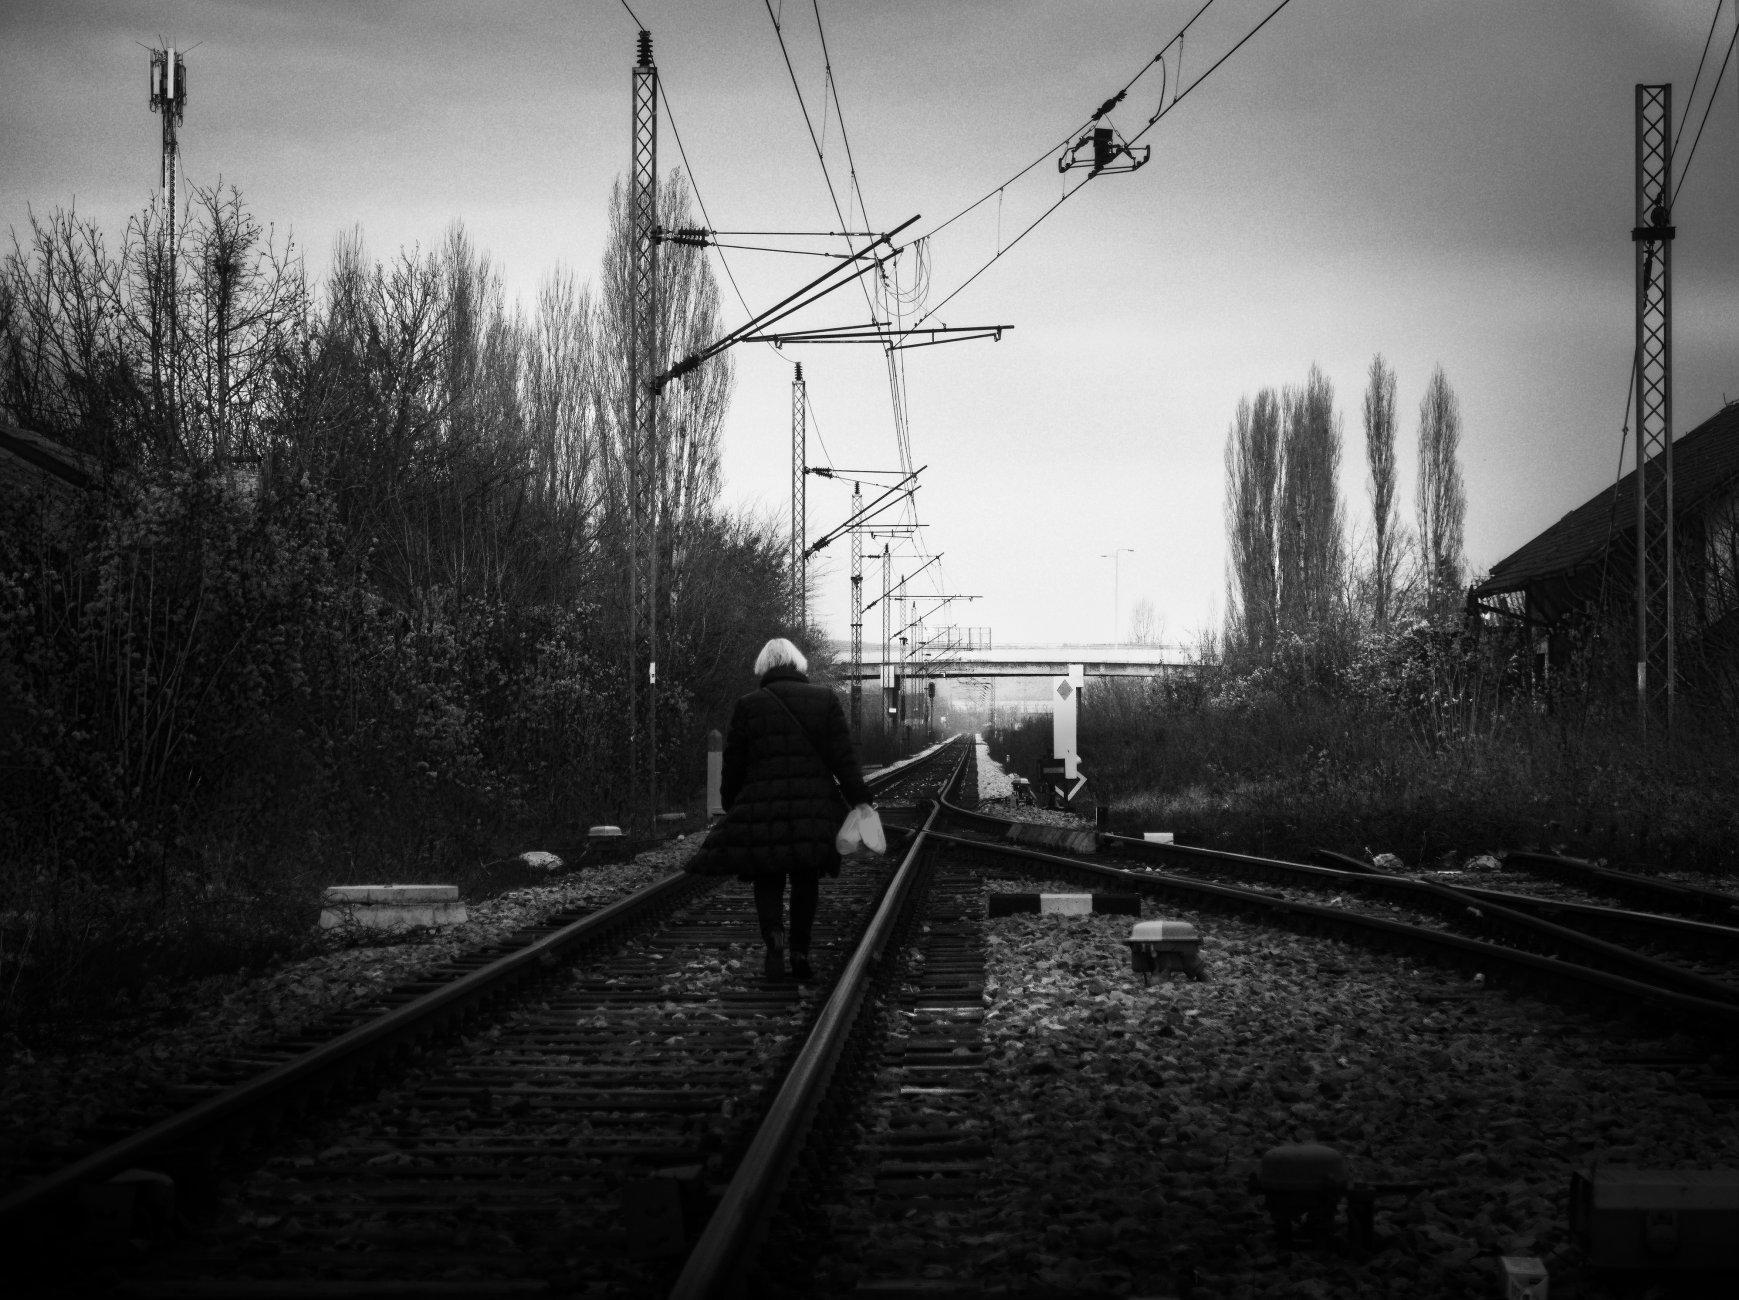 About the railway - XXVII